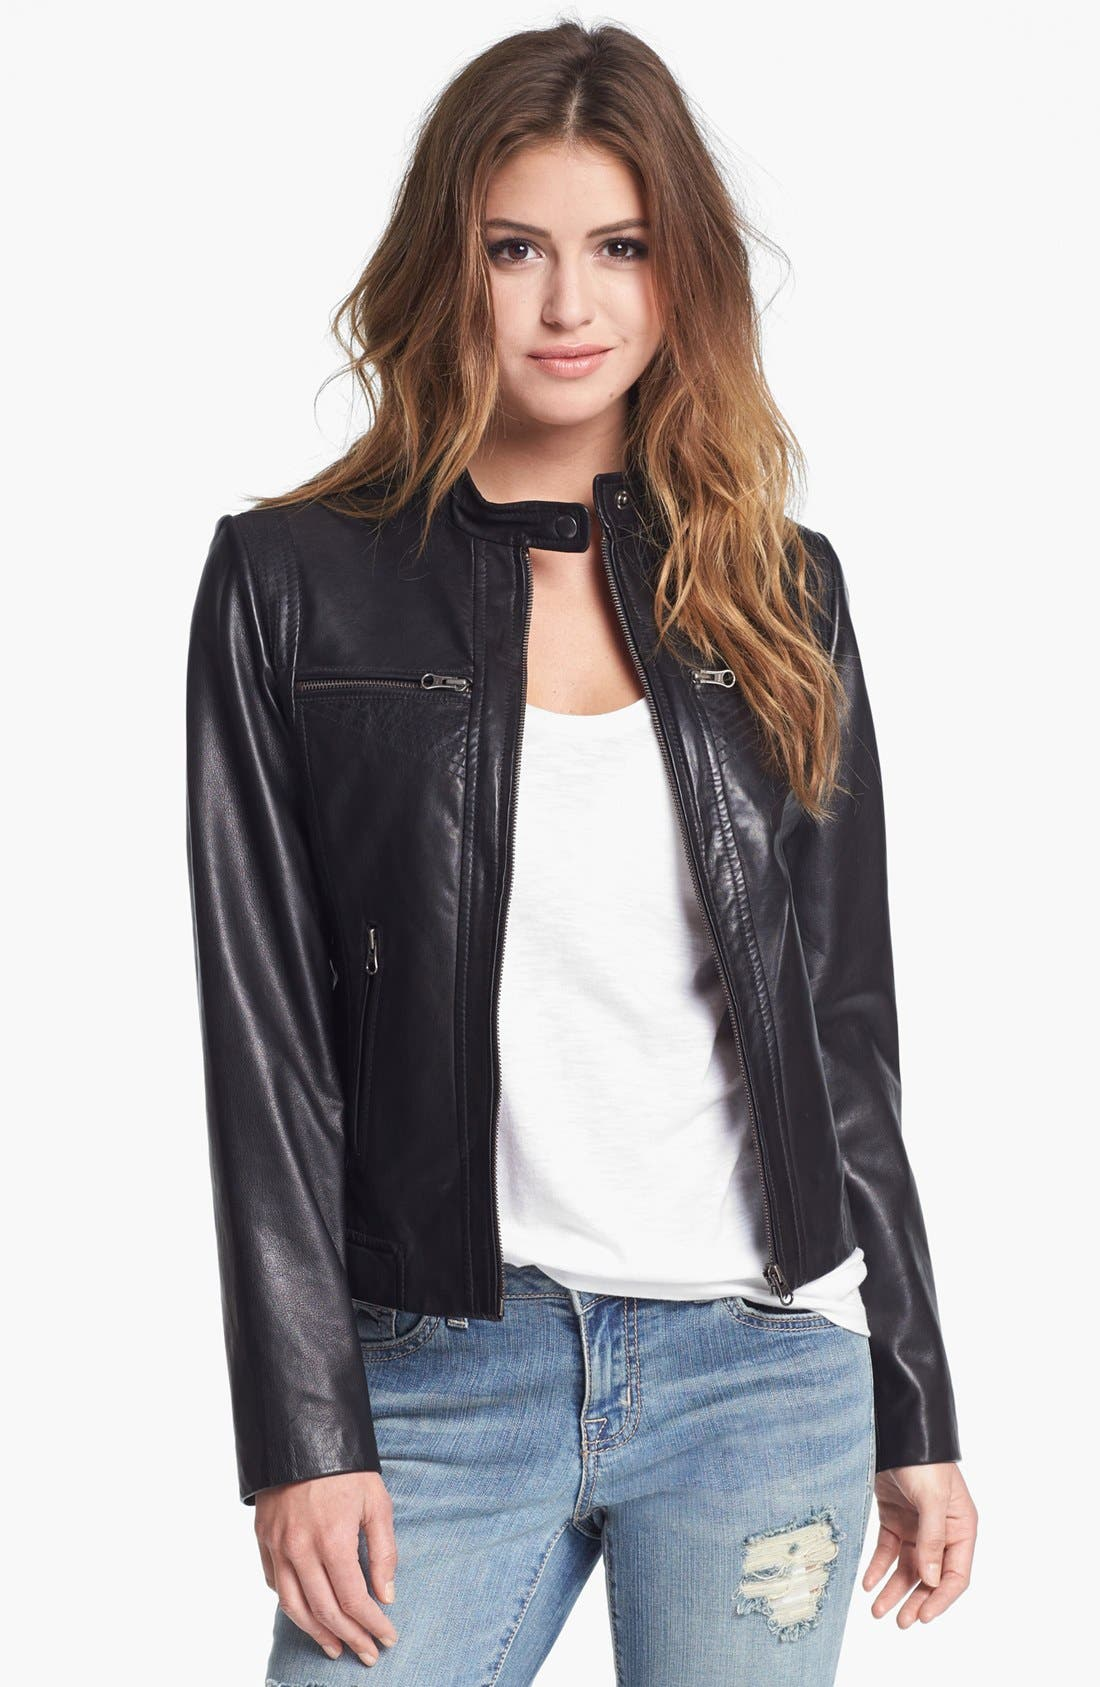 Alternate Image 1 Selected - Bernardo Tab Collar Leather Jacket (Regular & Petite) (Nordstrom Exclusive)